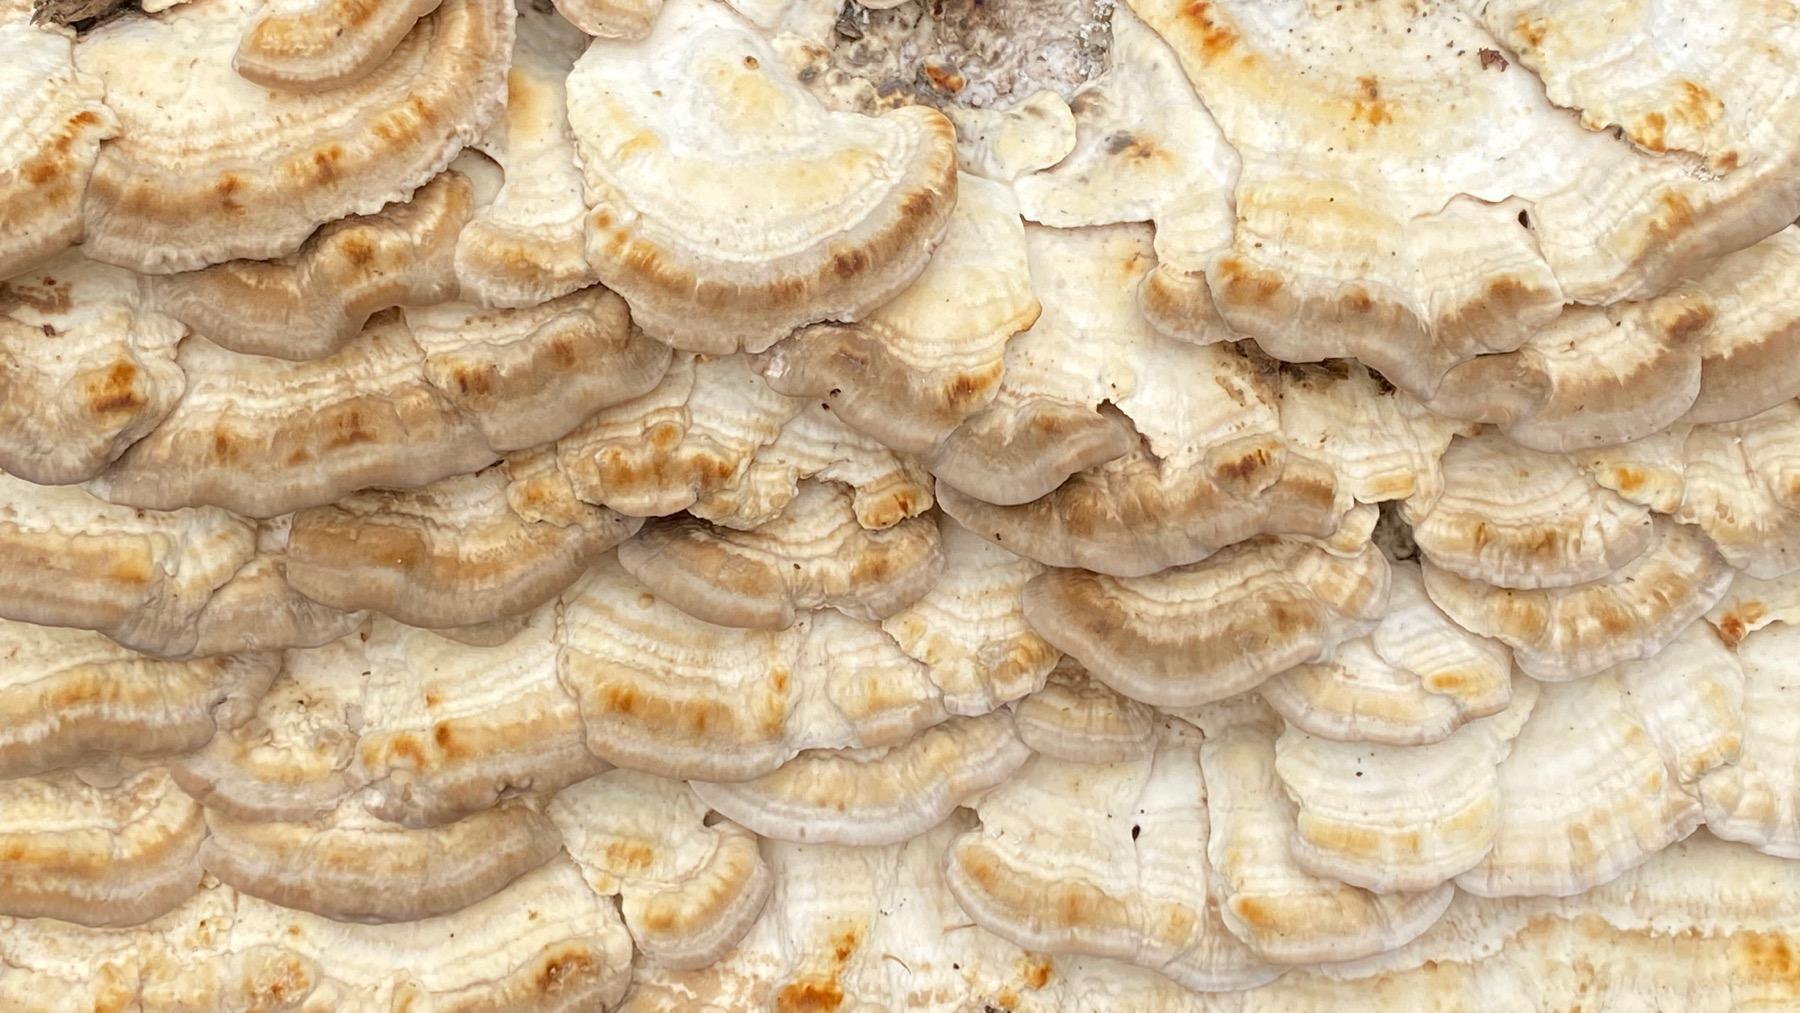 Yellowstone fungi